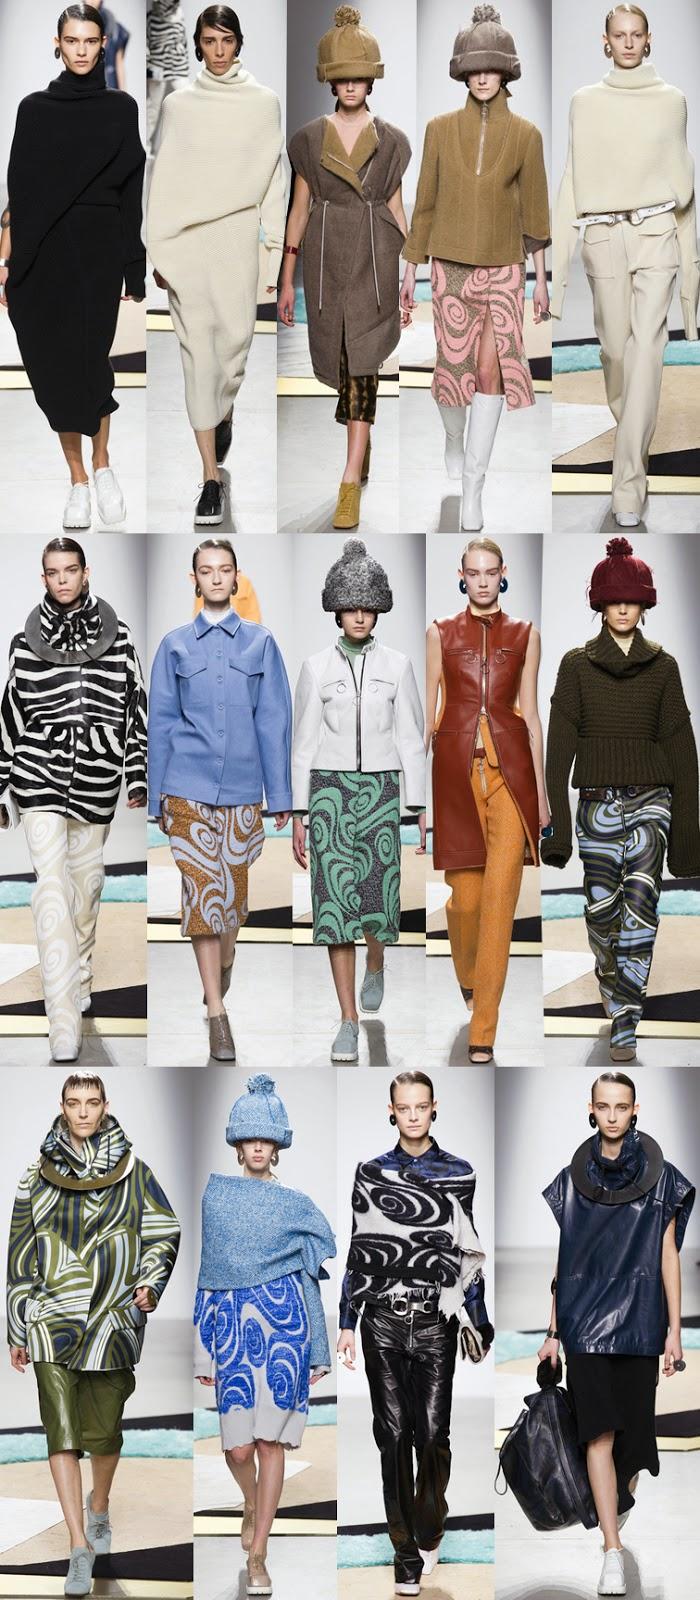 Acne Studios fall winter 2014 runway collection, PFW, FW14, AW14, Paris fashion week